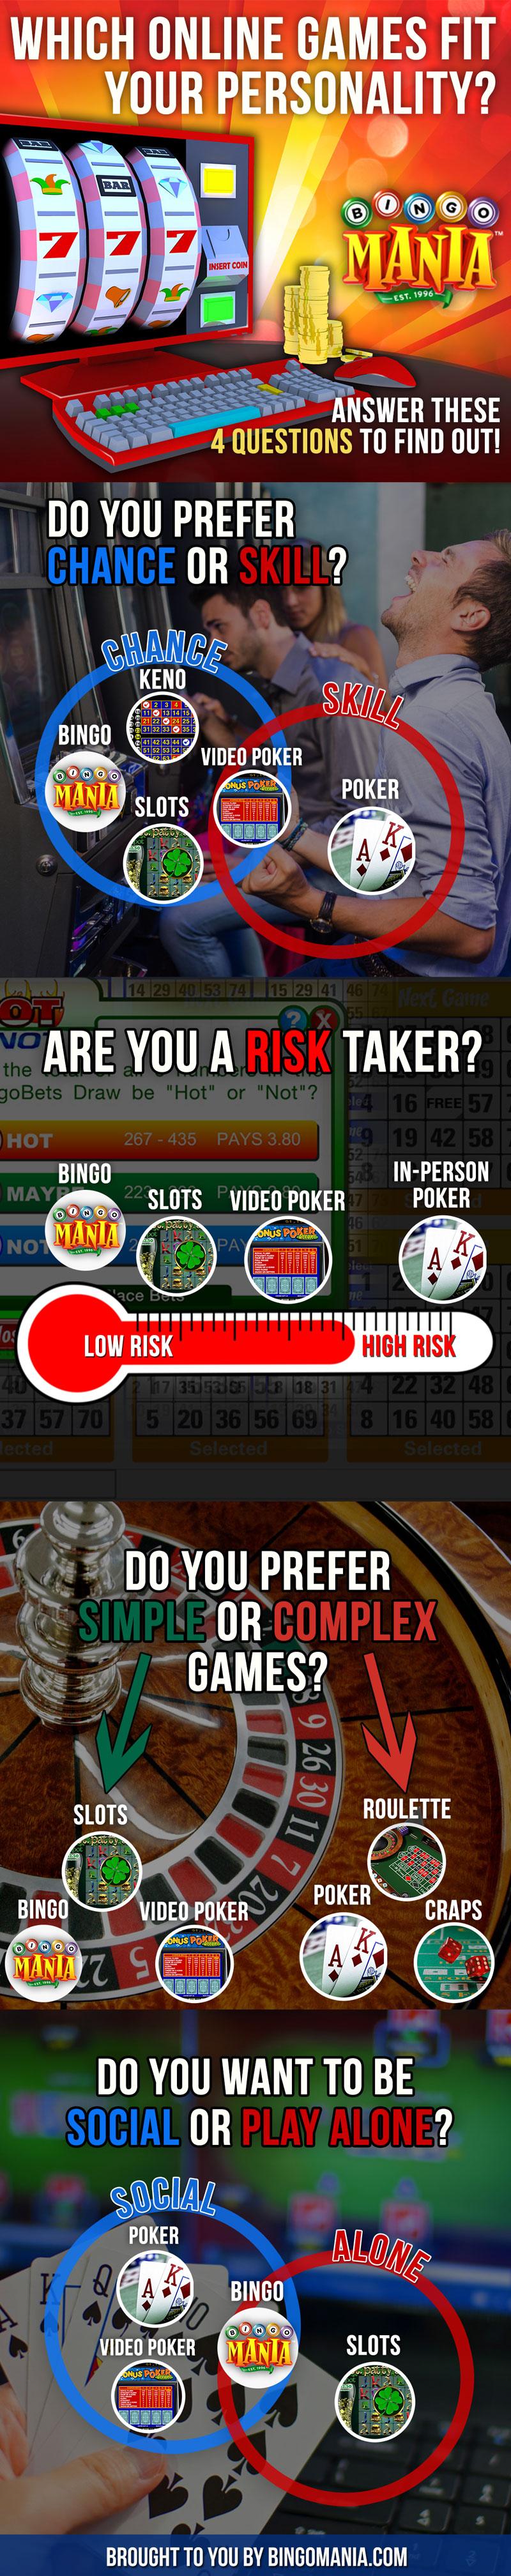 Bingomania-Games-Quiz-Infographic